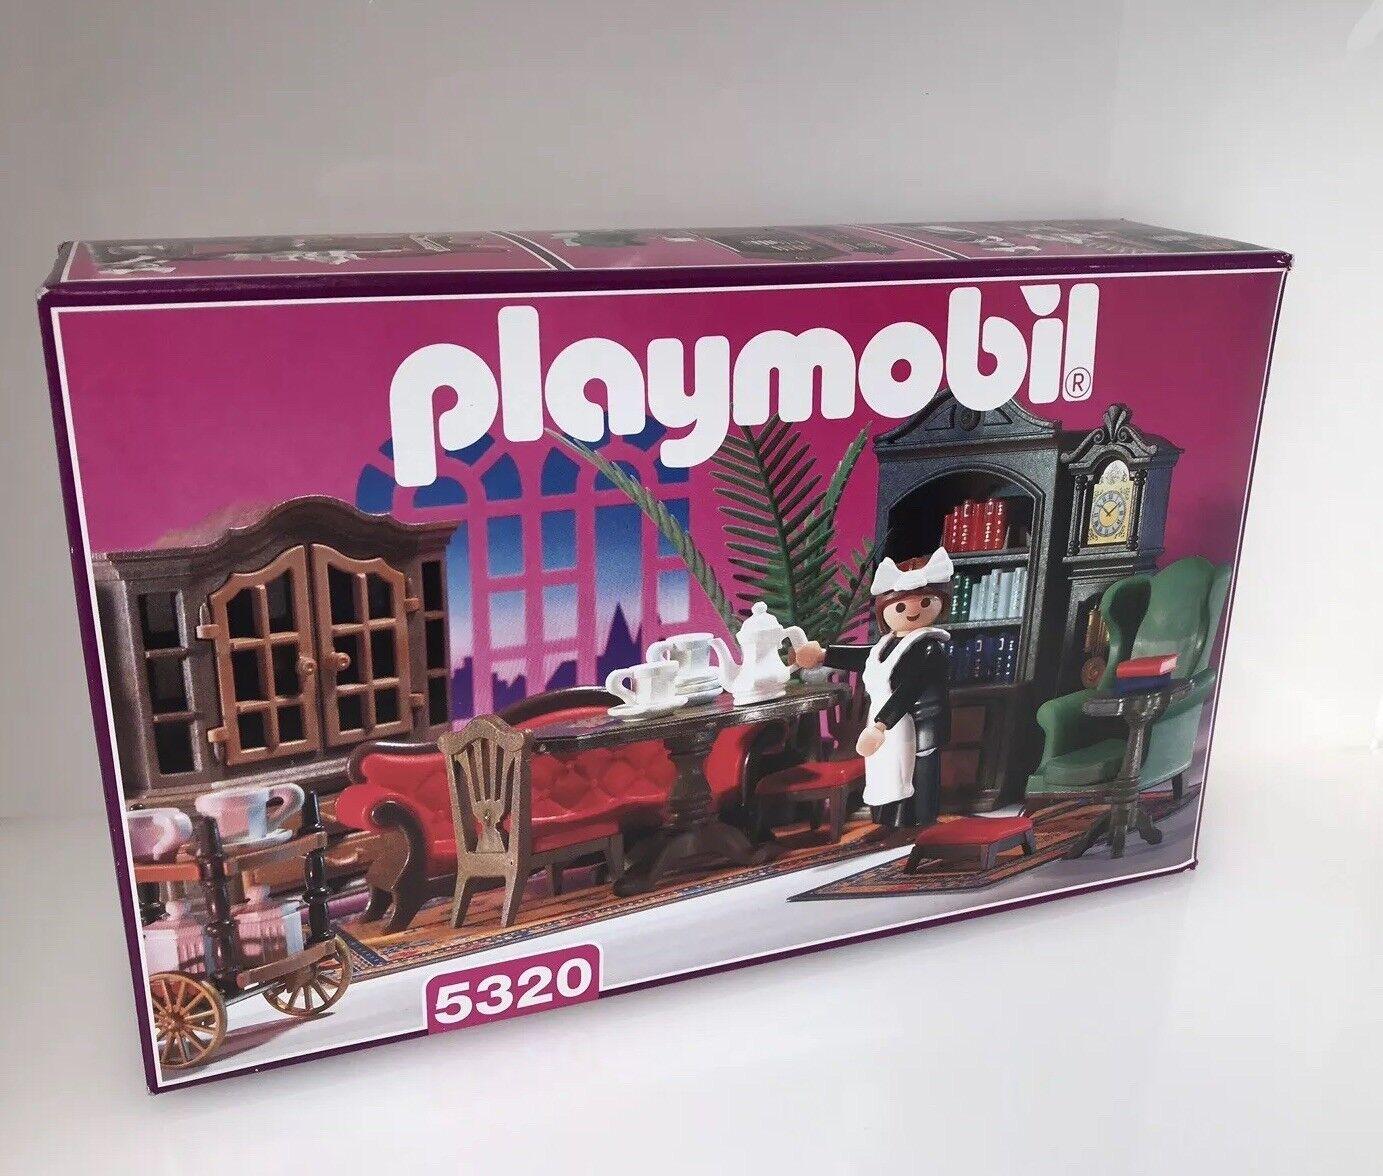 Playmobil Victorian Mansion Furniture Furniture Furniture 5320 Vintage Dolls House Living Room Boxed b154ff